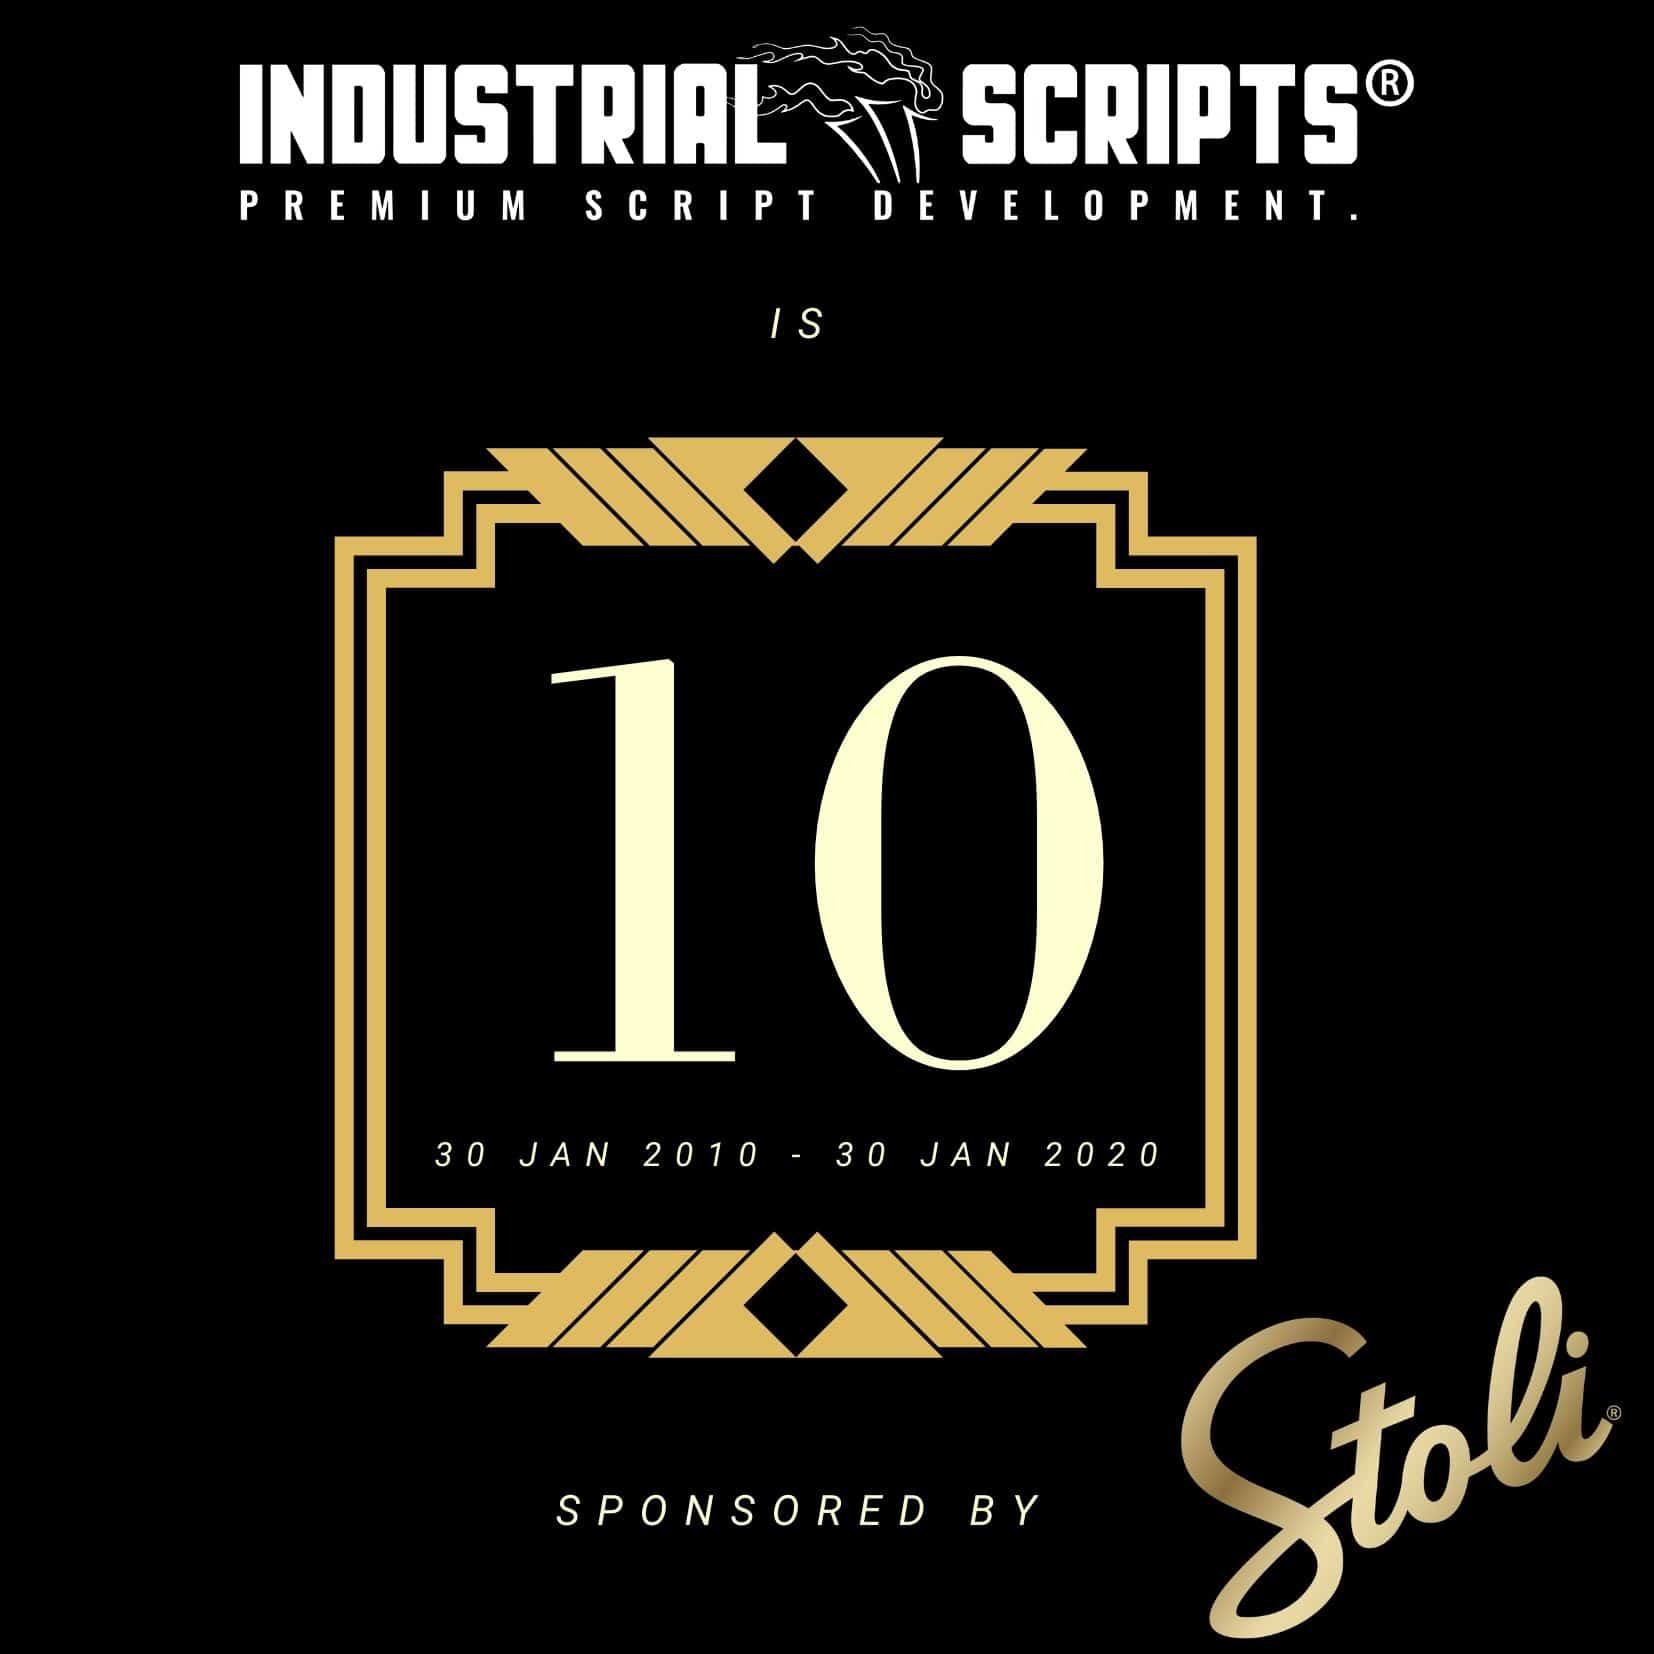 industrial scripts 10th anniversary